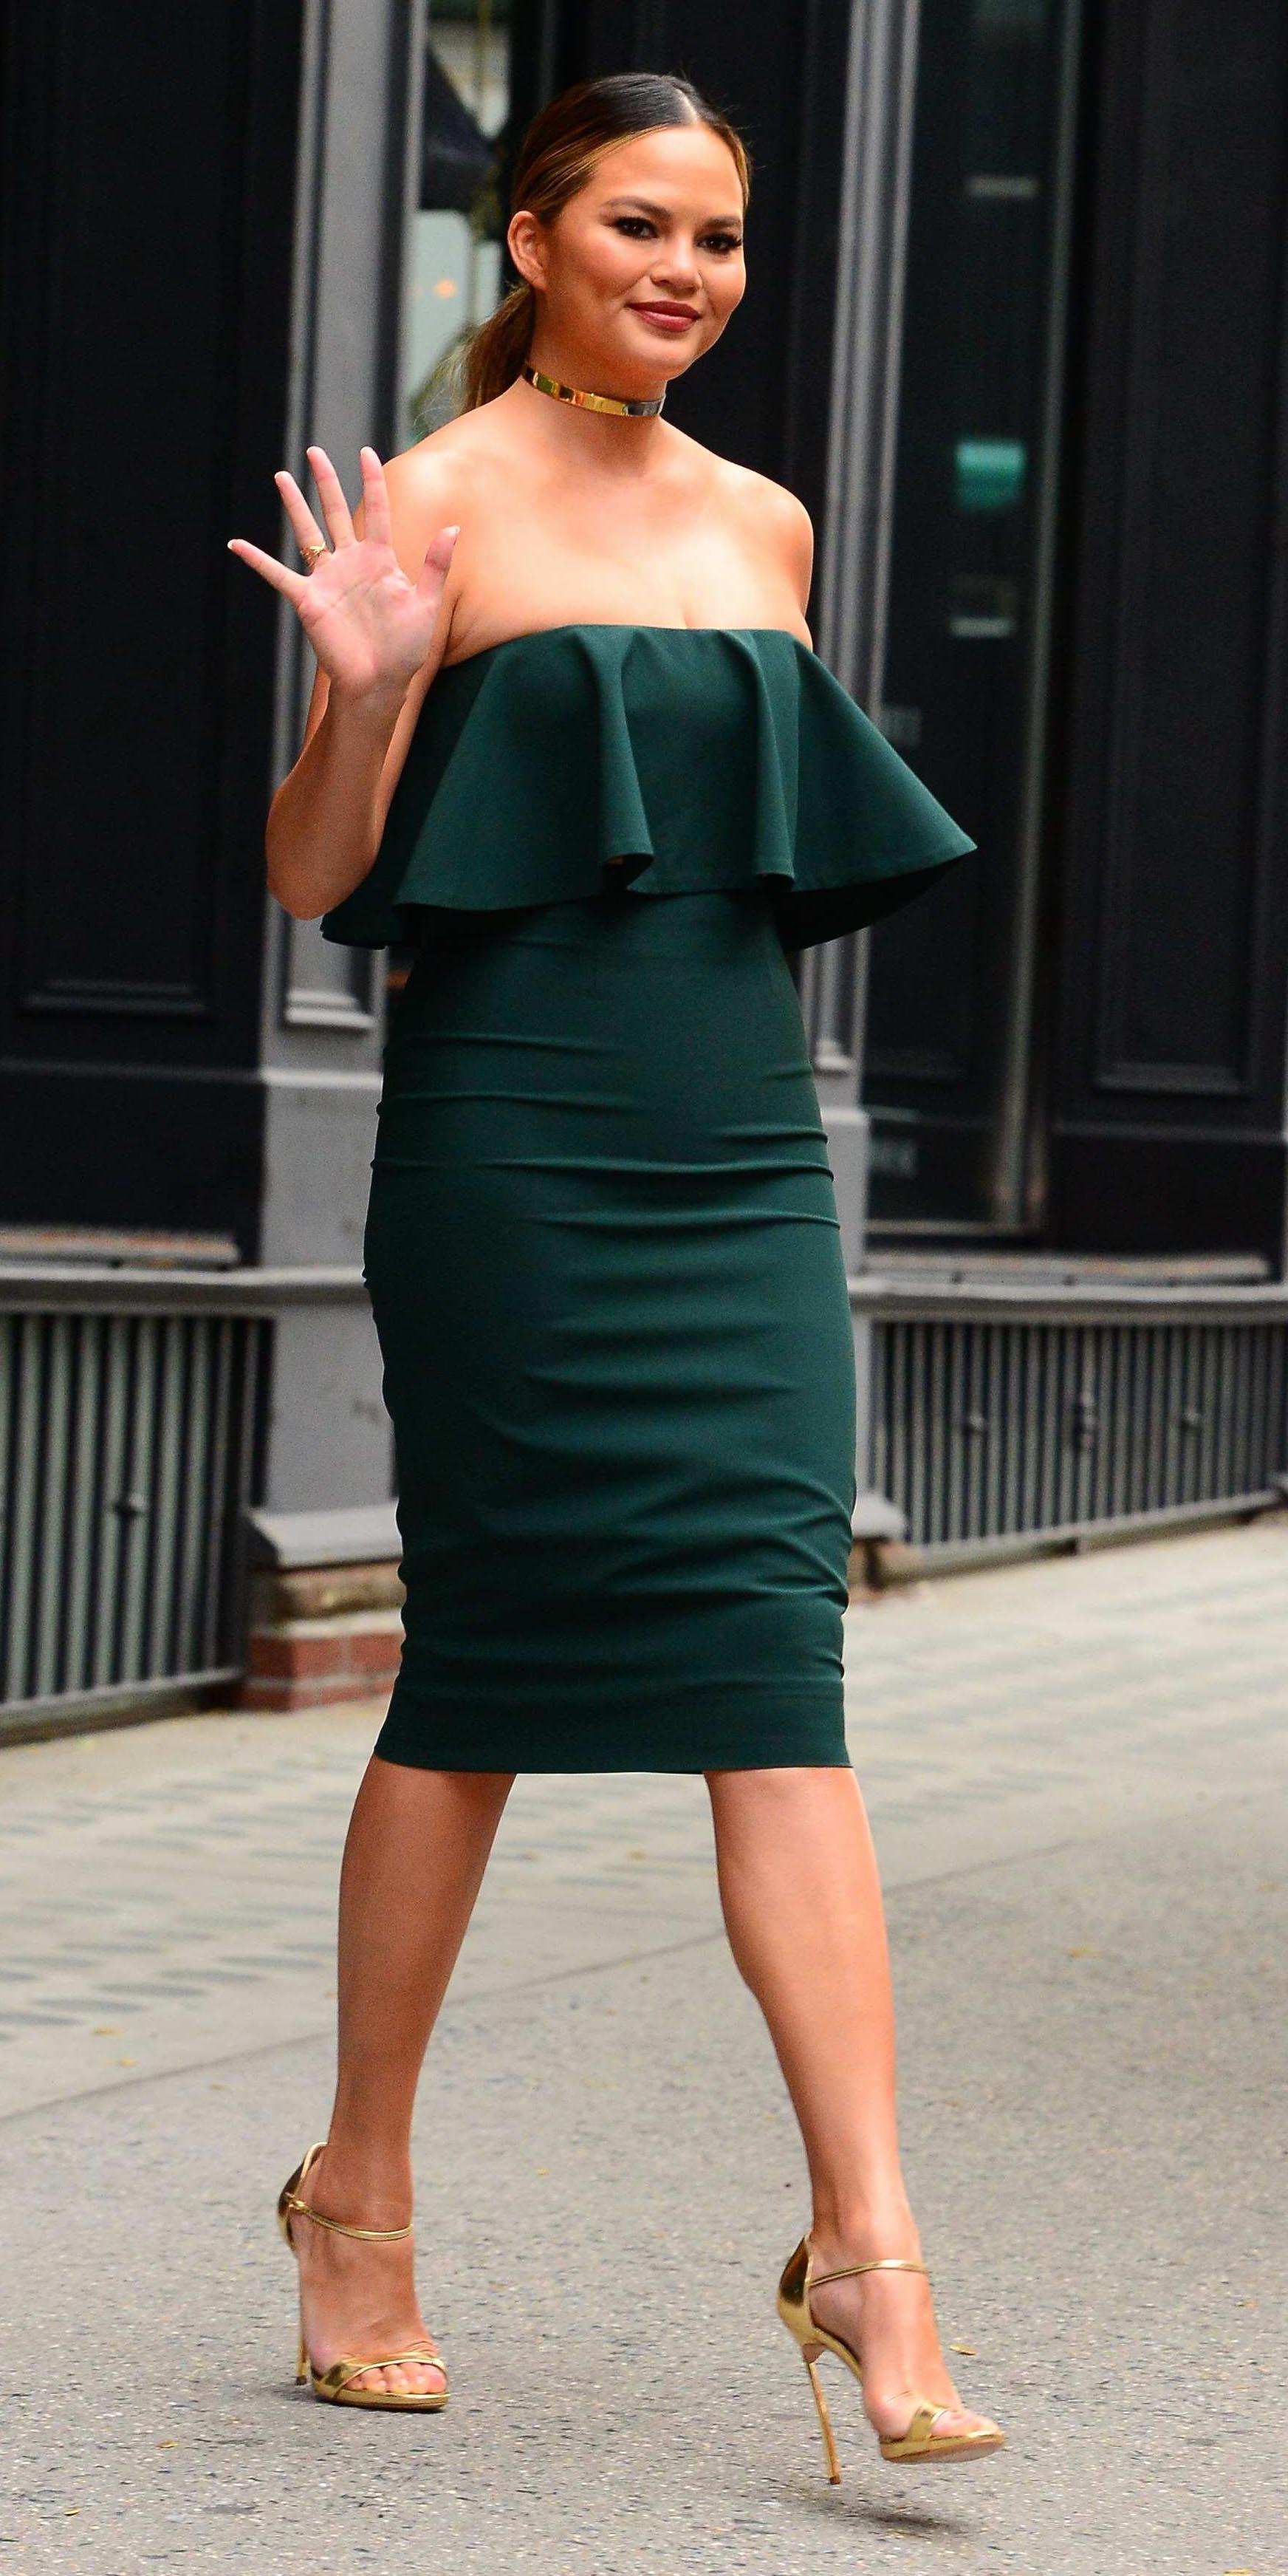 what-to-wear-for-a-winter-wedding-guest-outfit-green-dark-dress-bodycon-hairr-choker-necklace-pony-chrissyteigen-tan-shoe-sandalh-gold-strapless-dinner.jpg